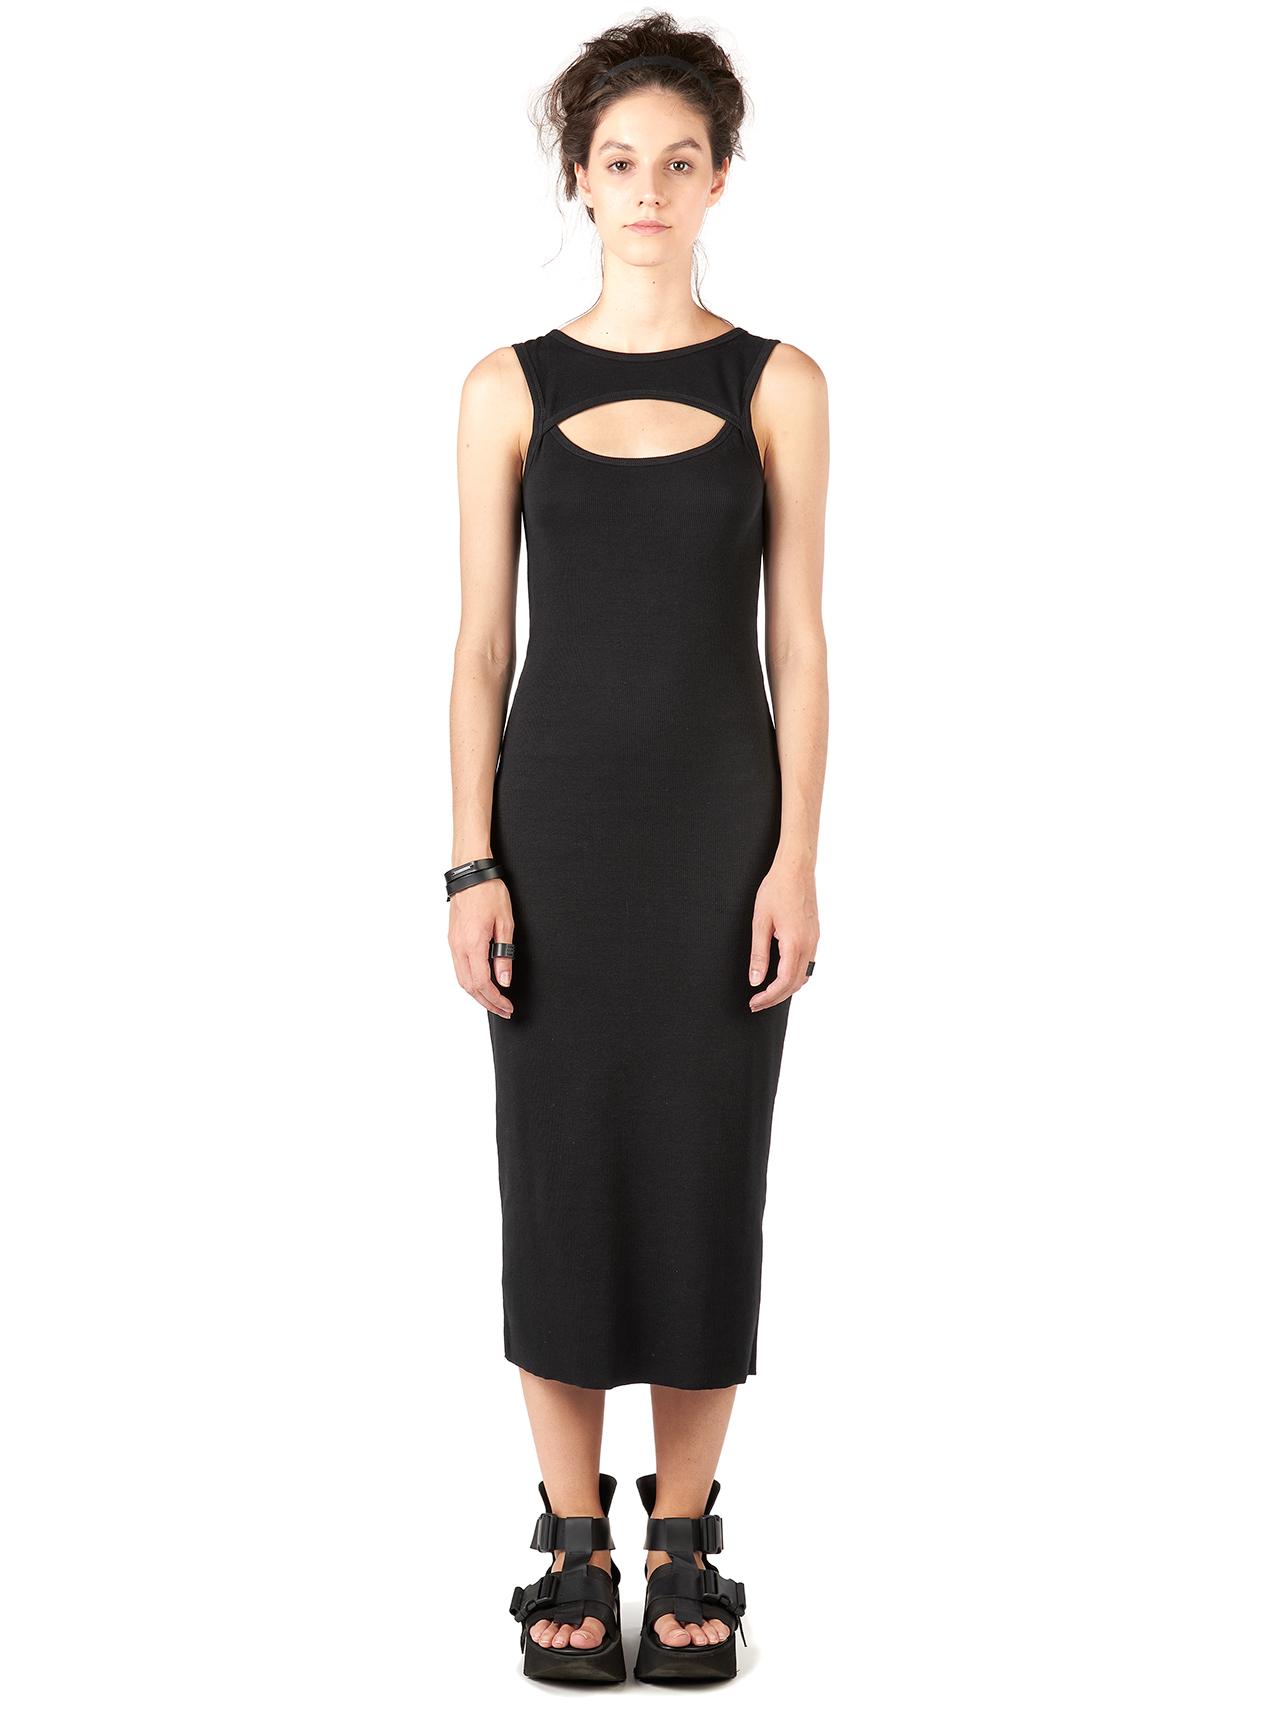 SCURA dress